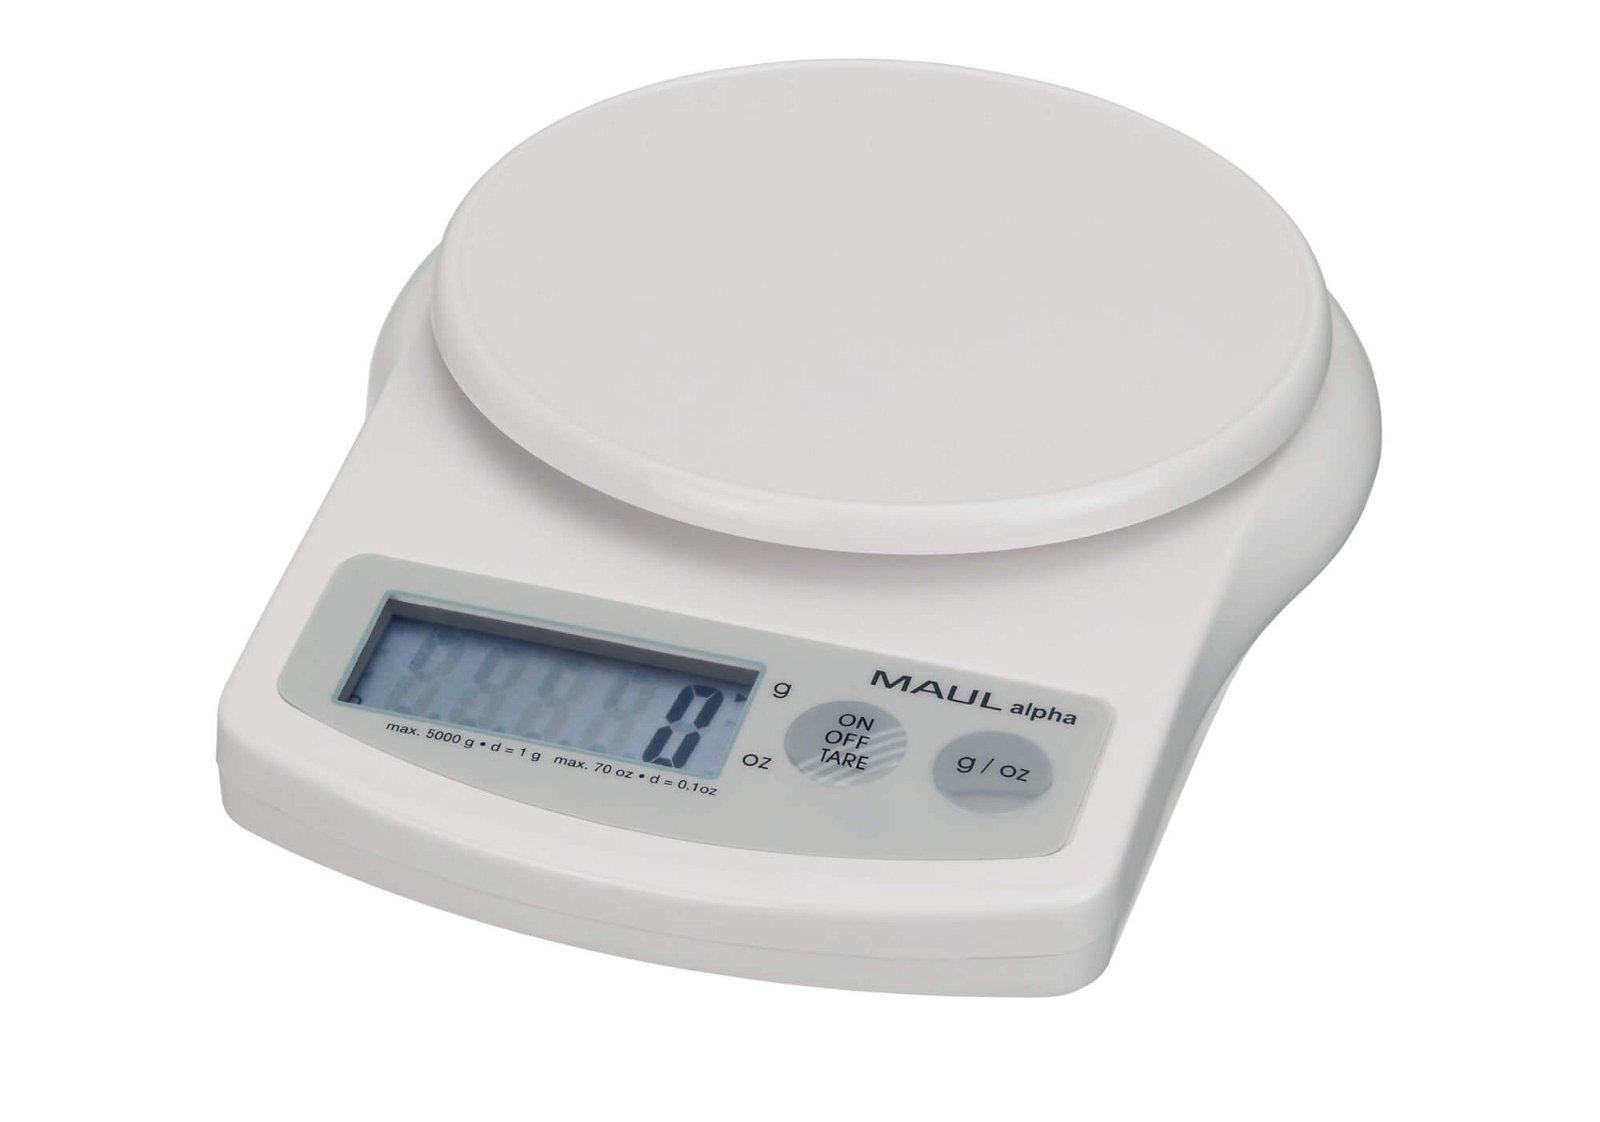 Briefwaage MAULalpha mit Batterie, 5000 g, weiß